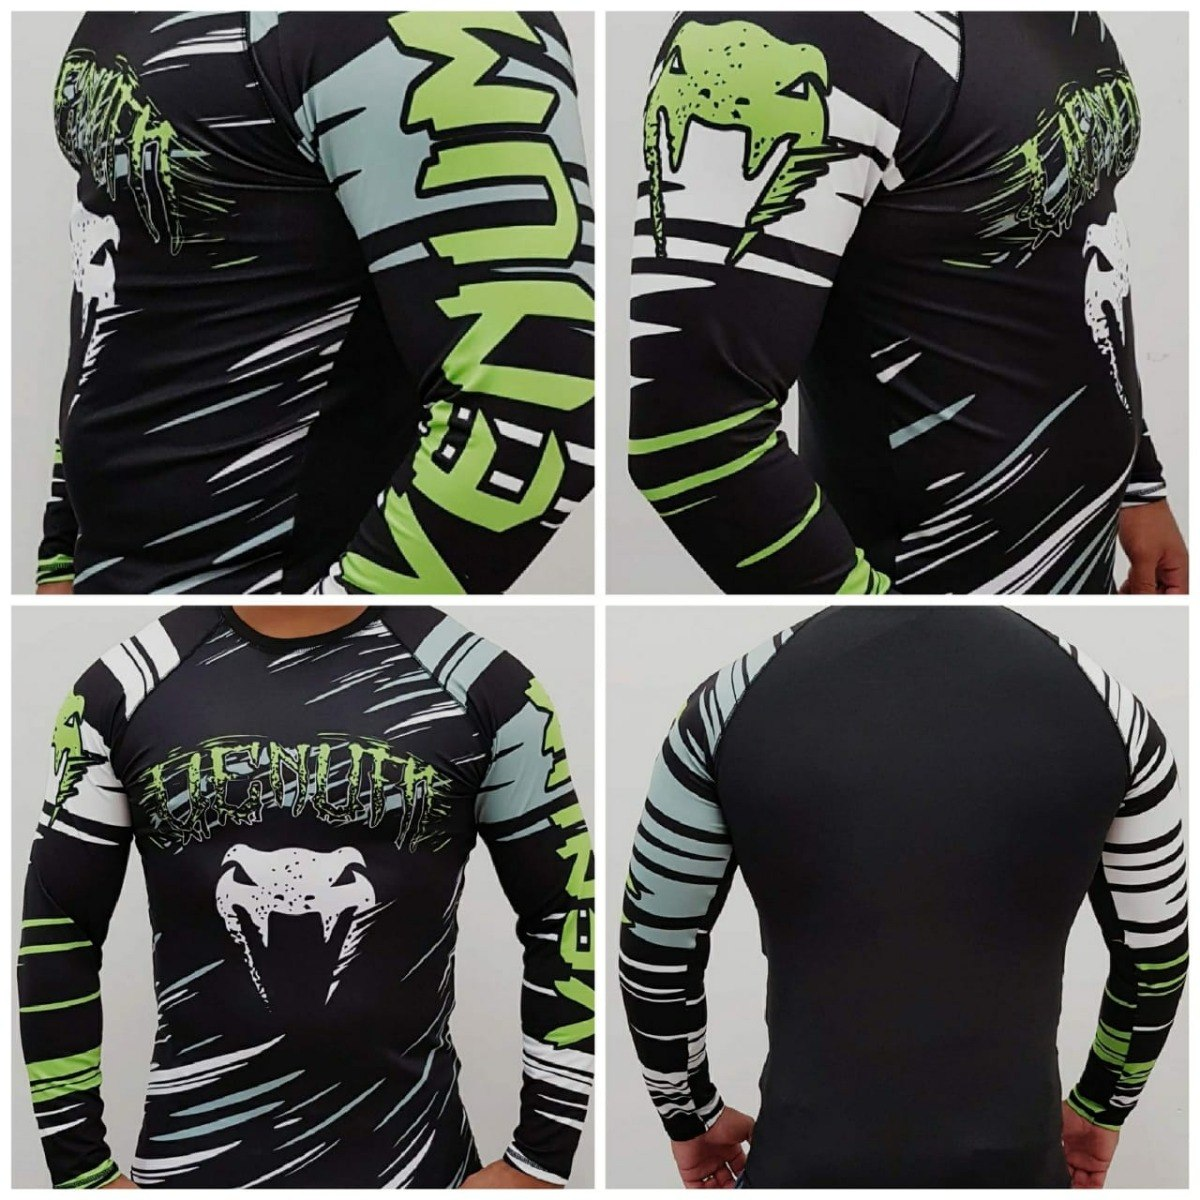 camisa térmica manga longa black skull promoção. Carregando zoom. 073927b2c56c6